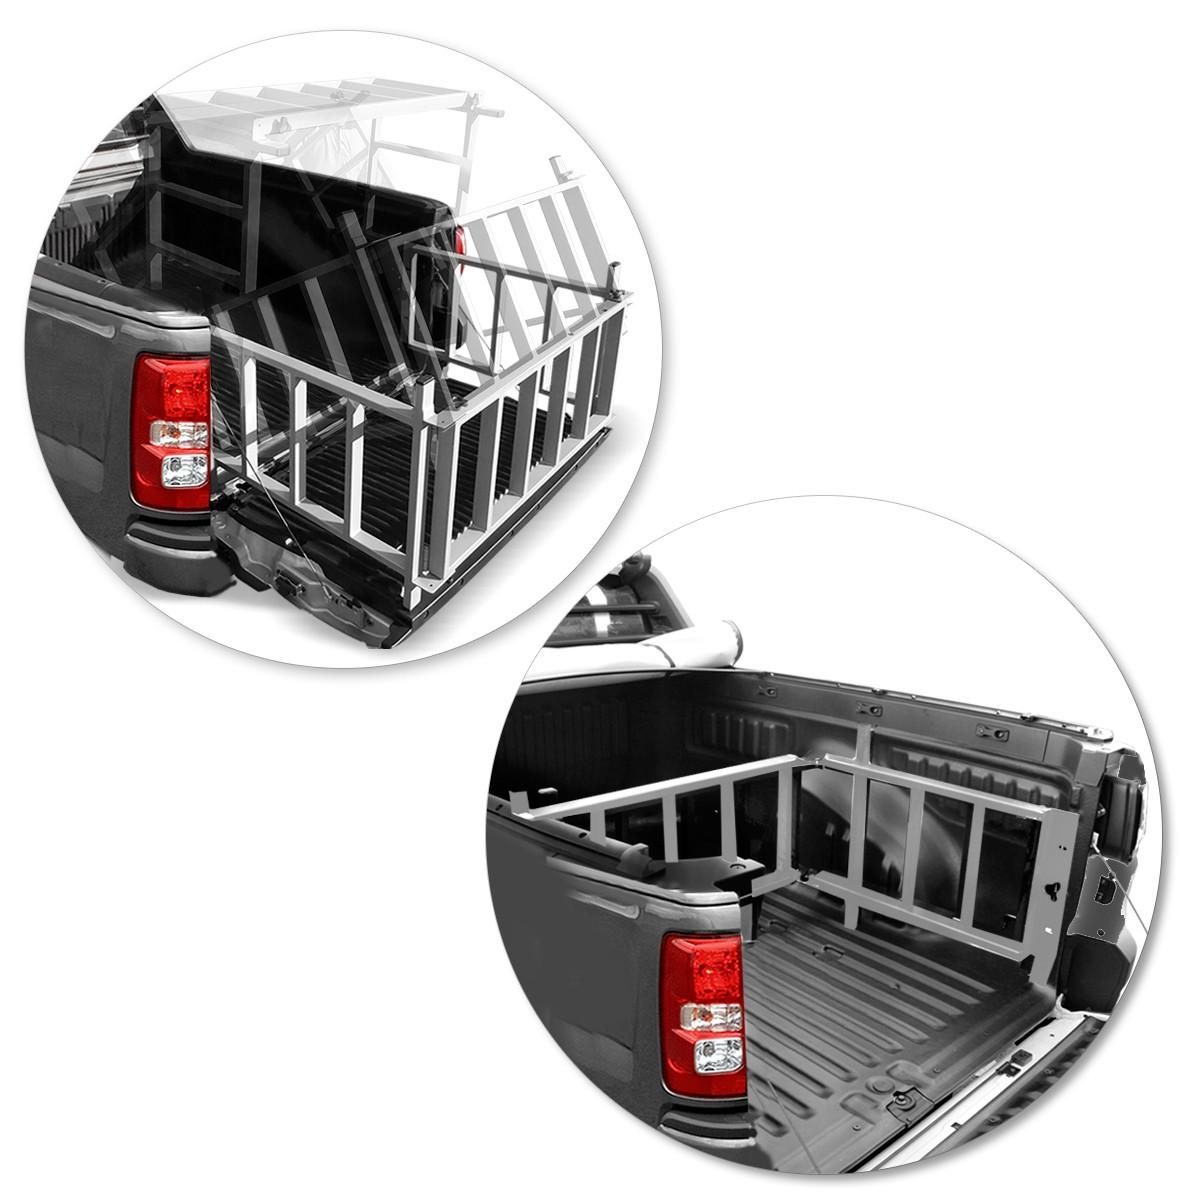 Extensor De Caçamba S10 2012 a 2020 C/ Rampa EDR Prata